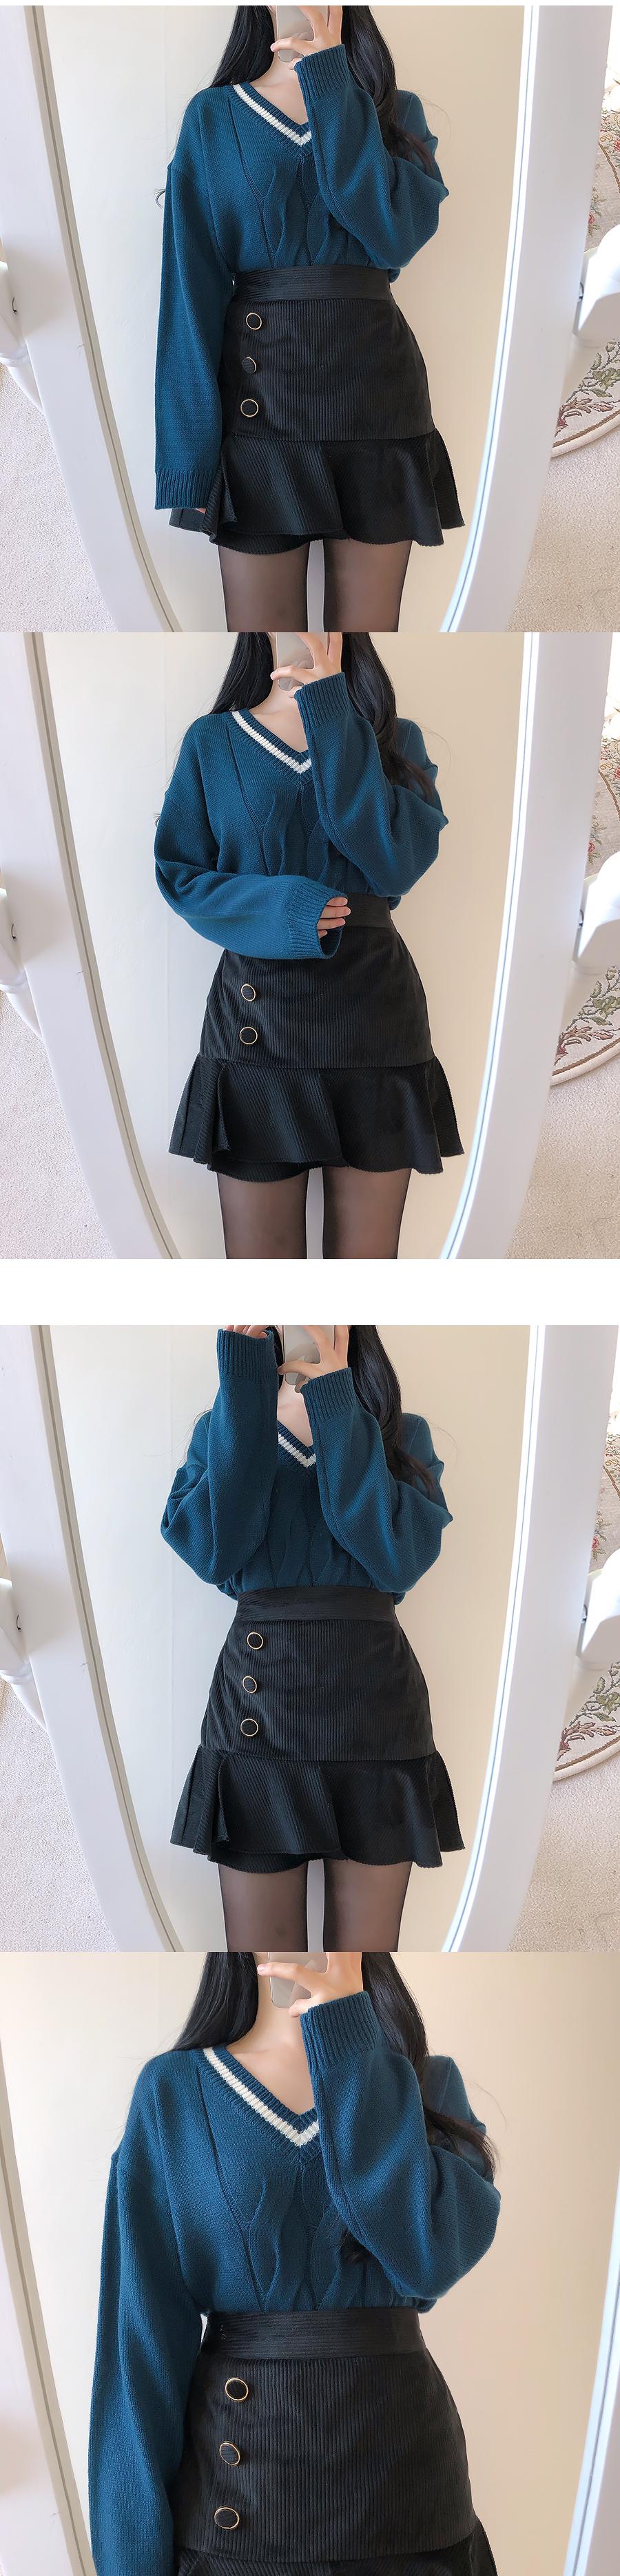 Way button skirt pants